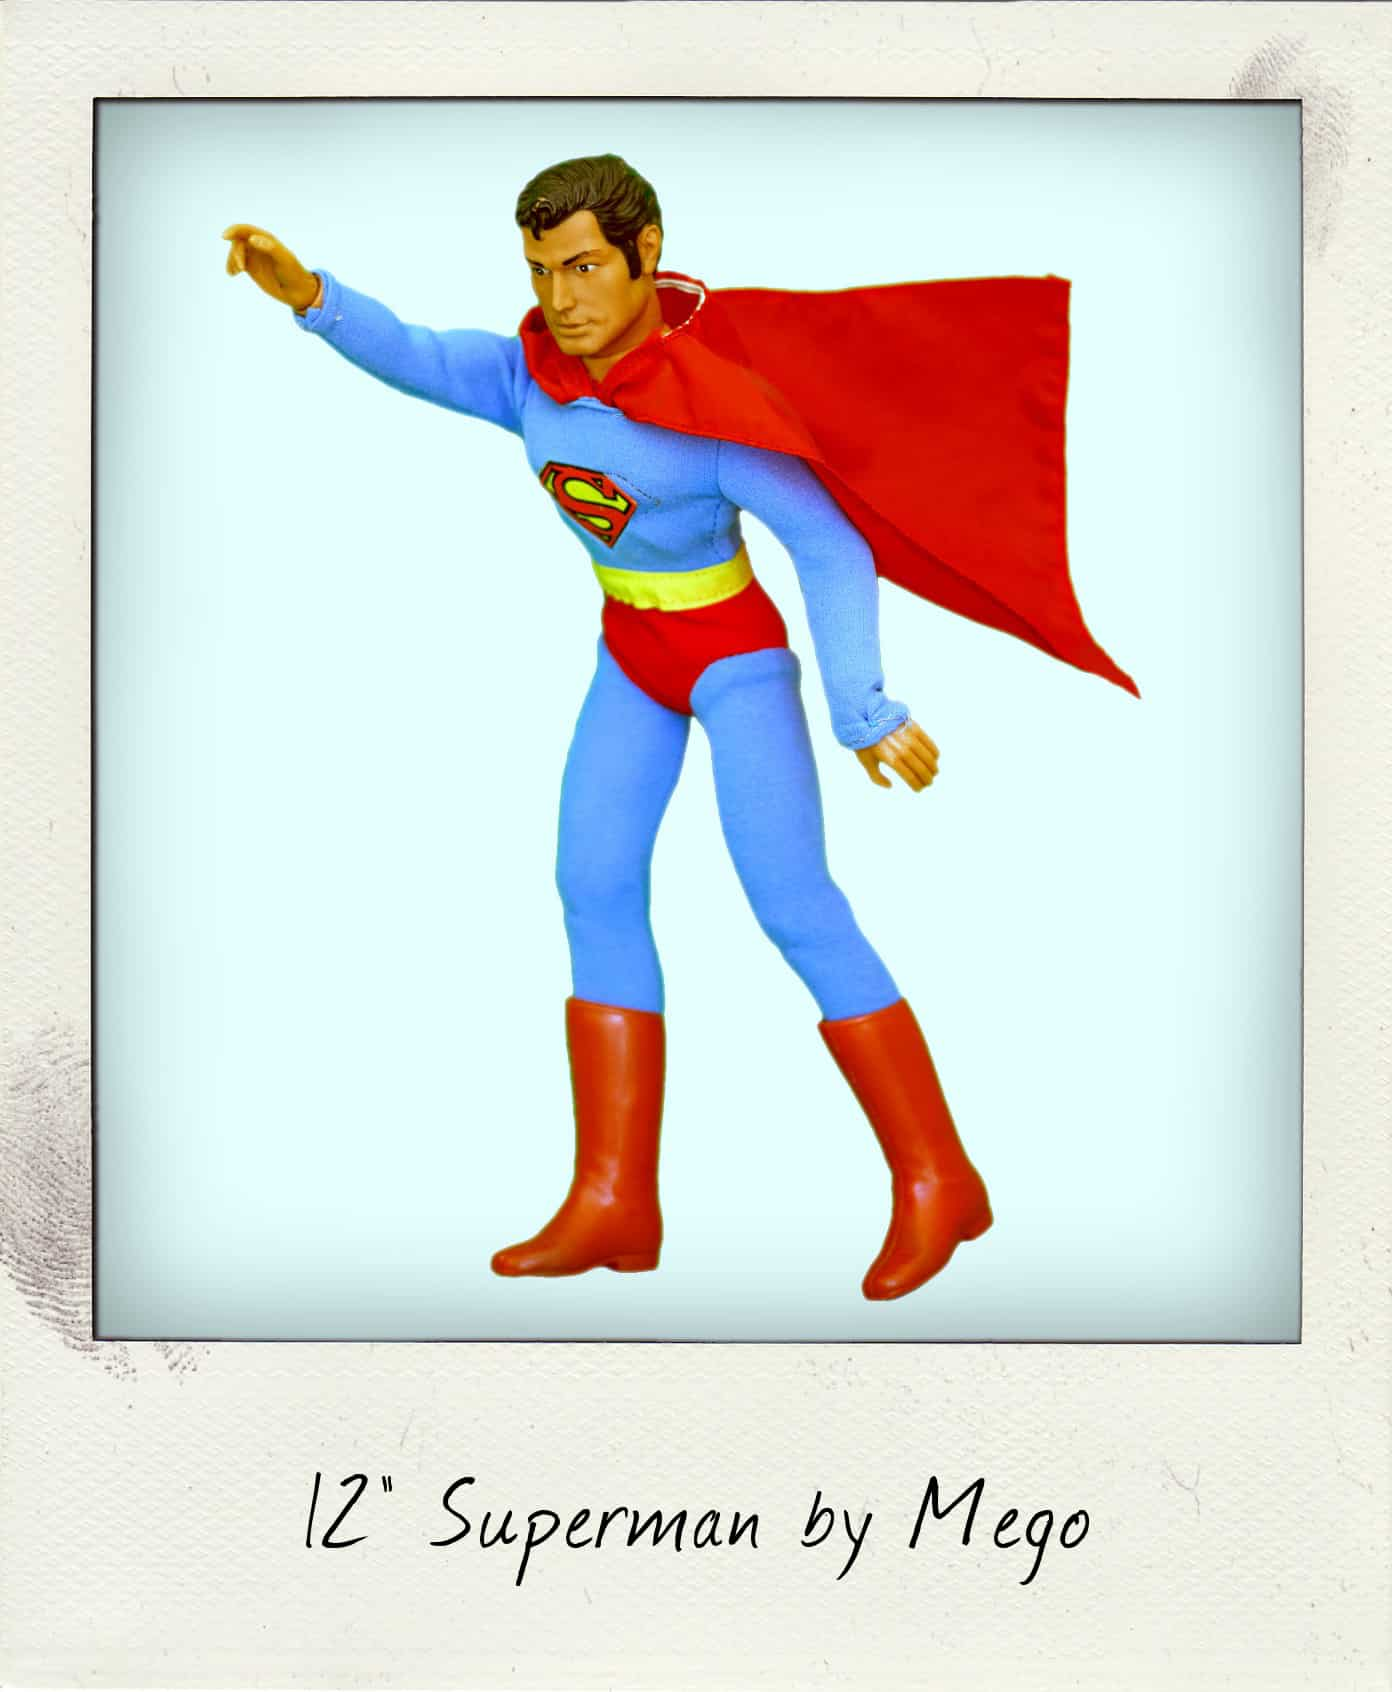 Superman Mego 12 inch